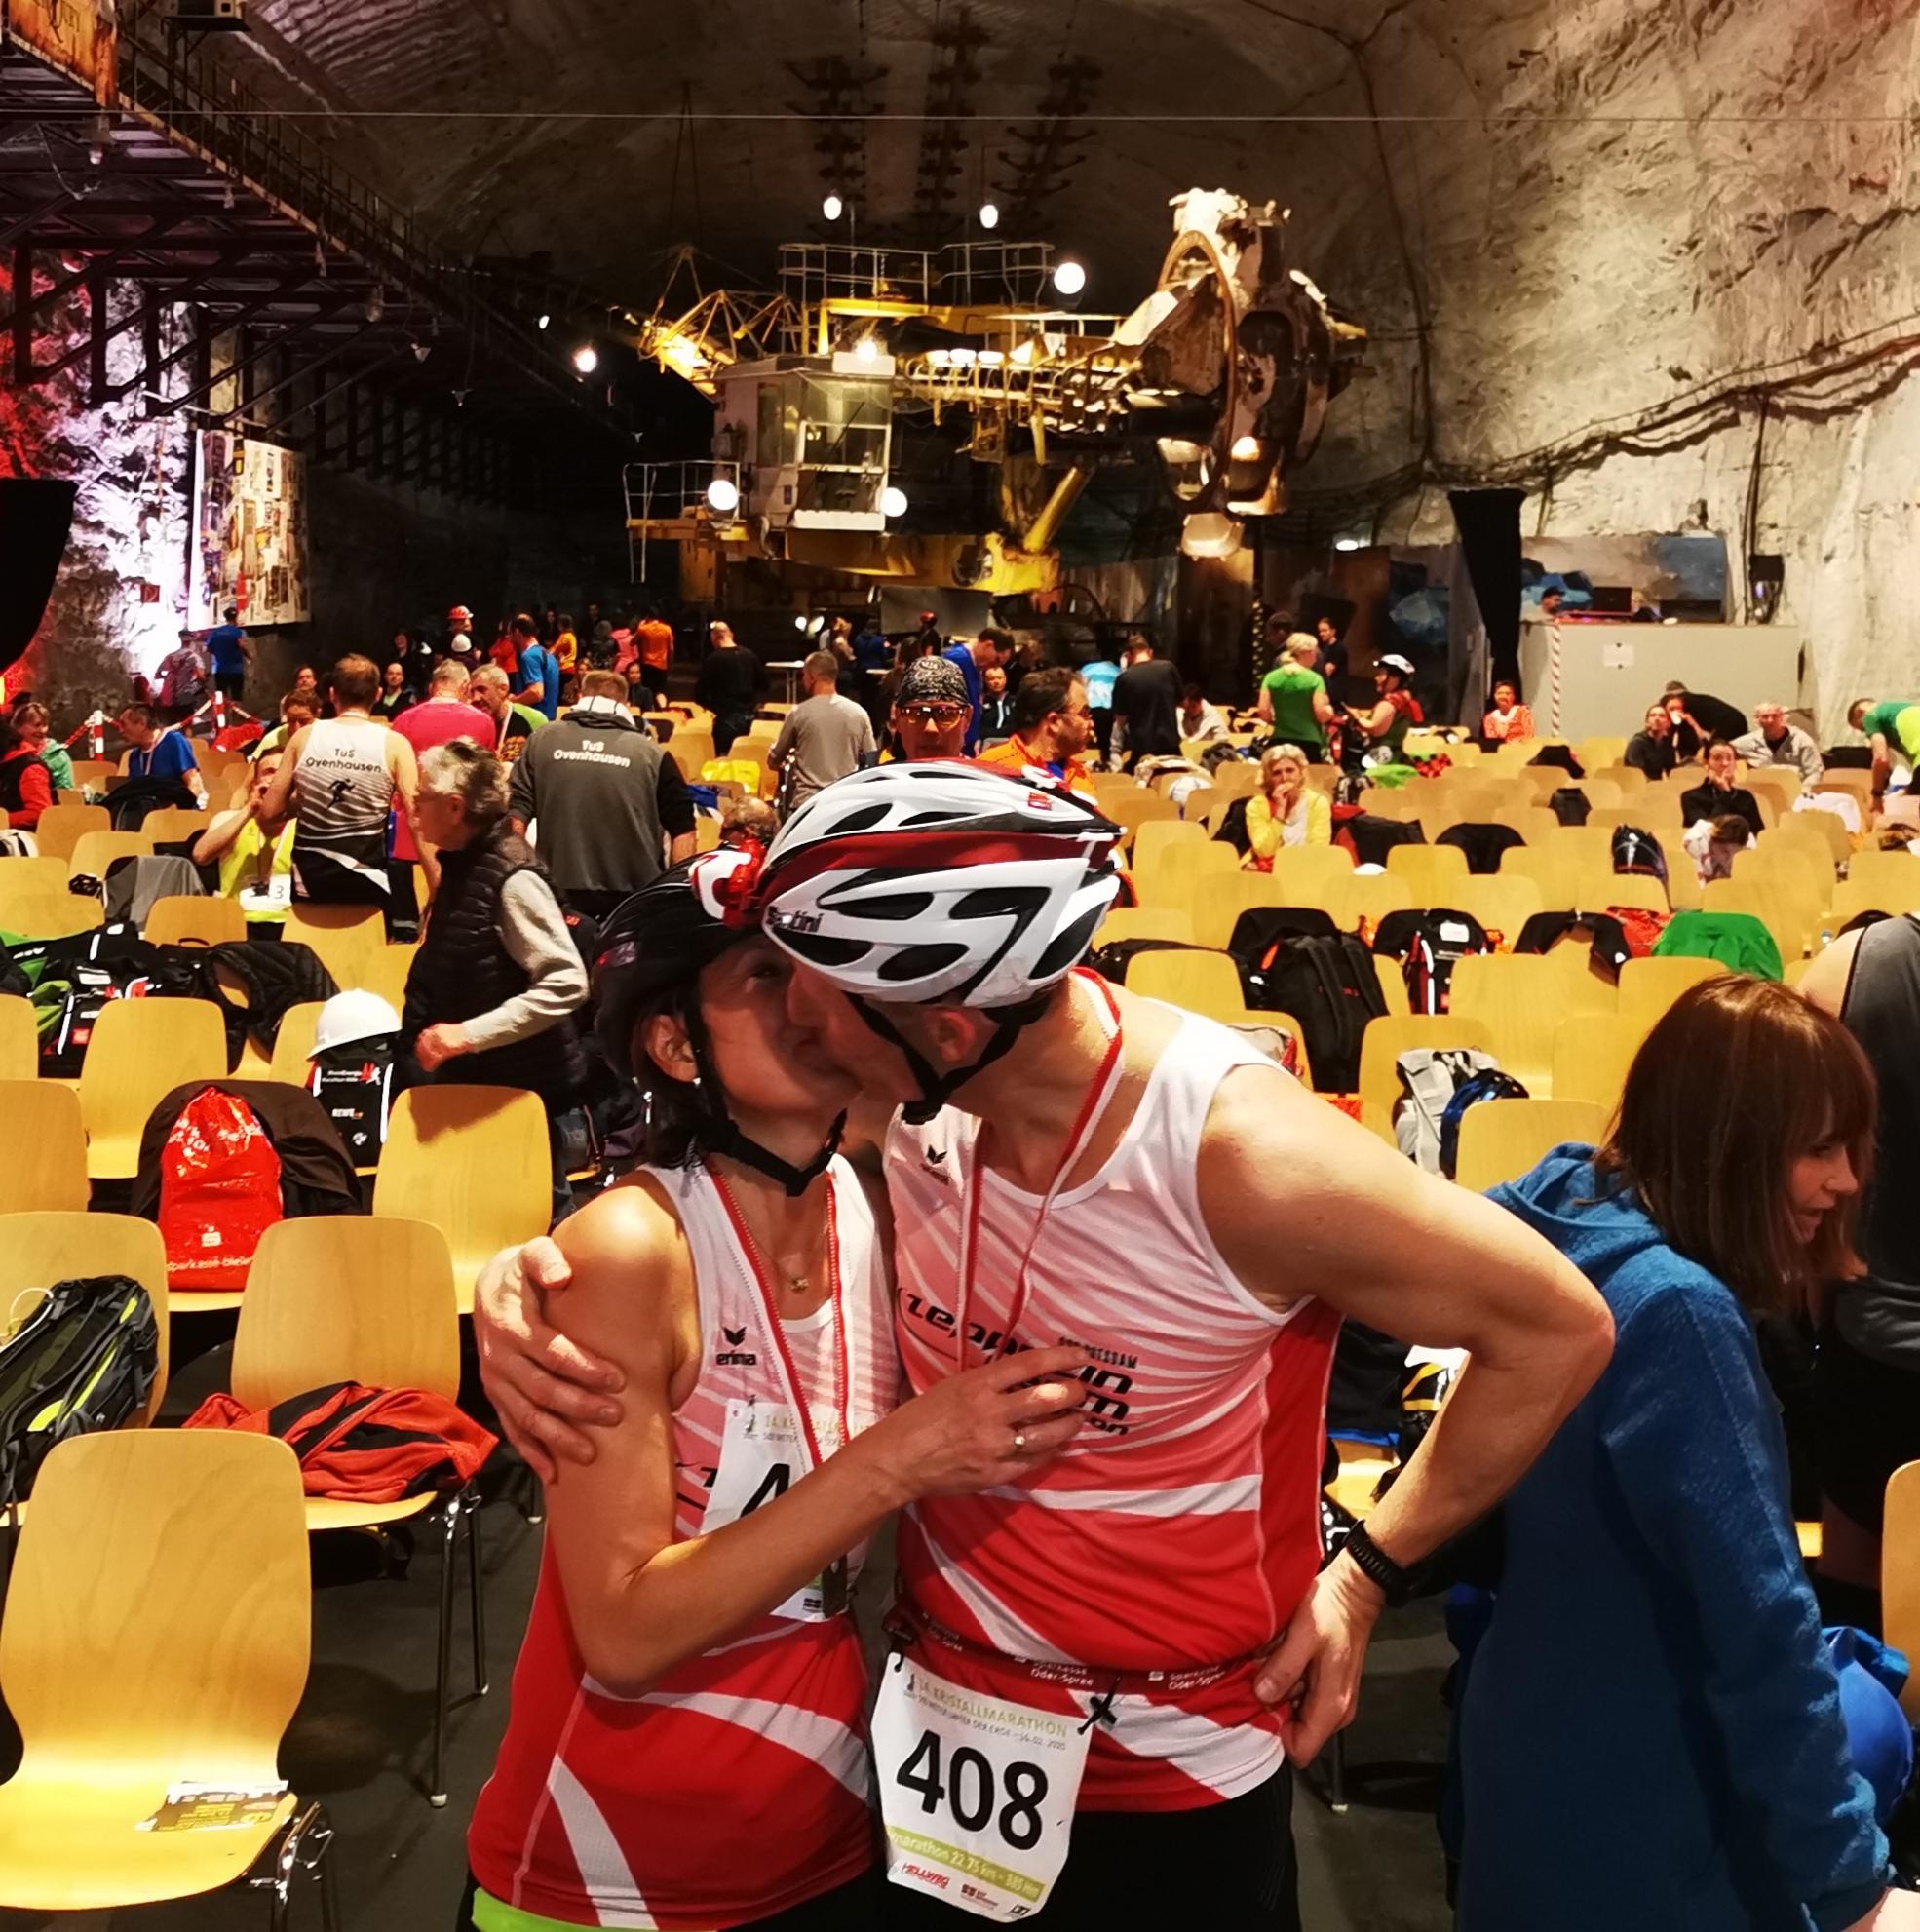 Kristall- Halbmarathon 400m unter Tage